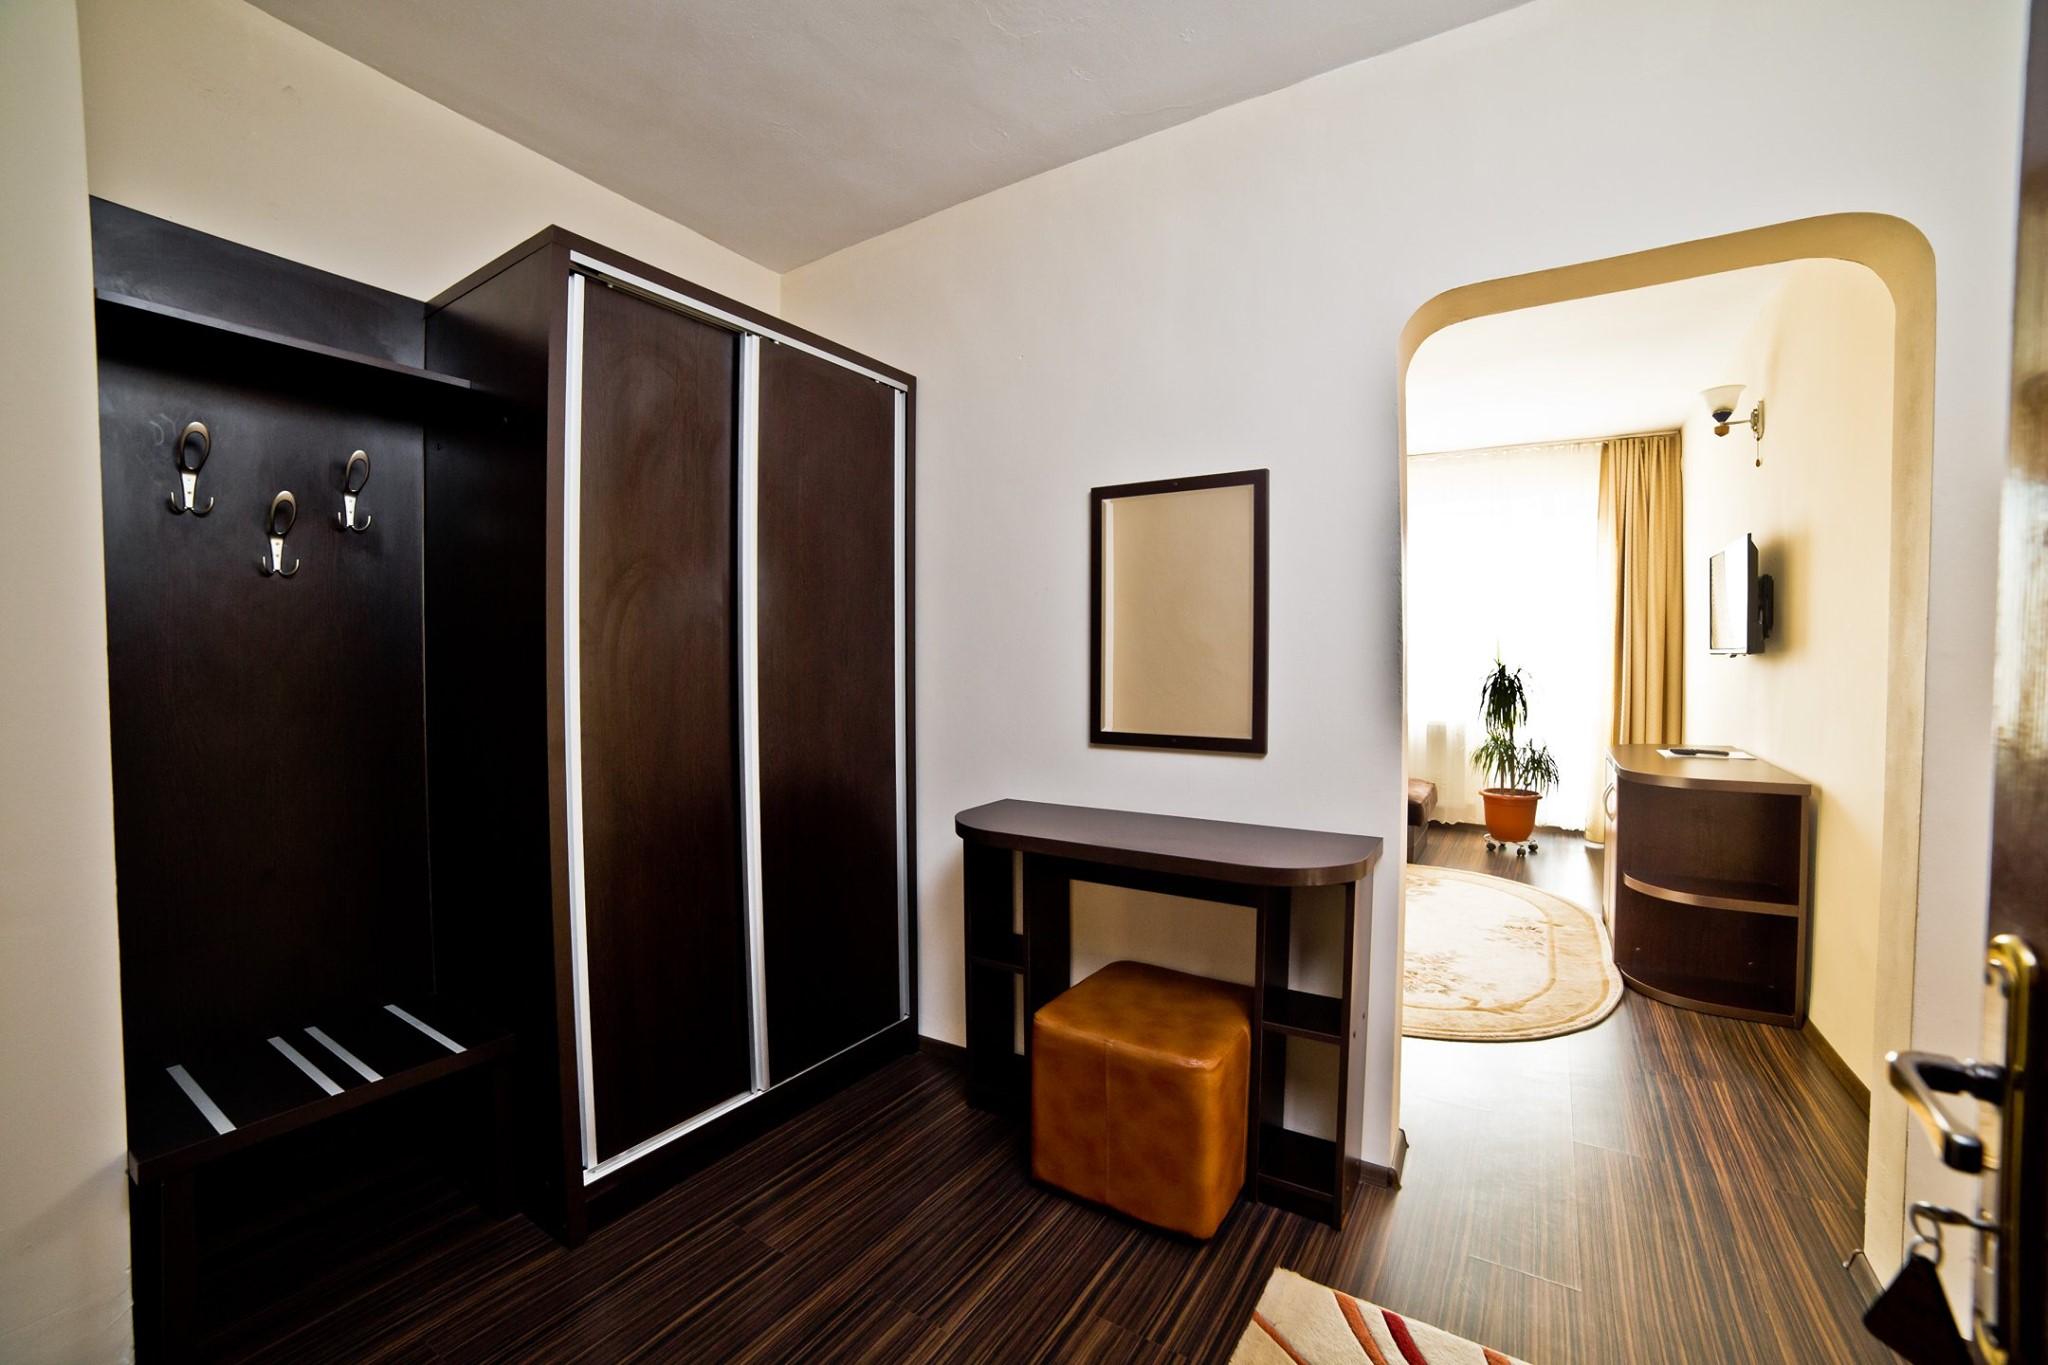 Camera dubla superioara